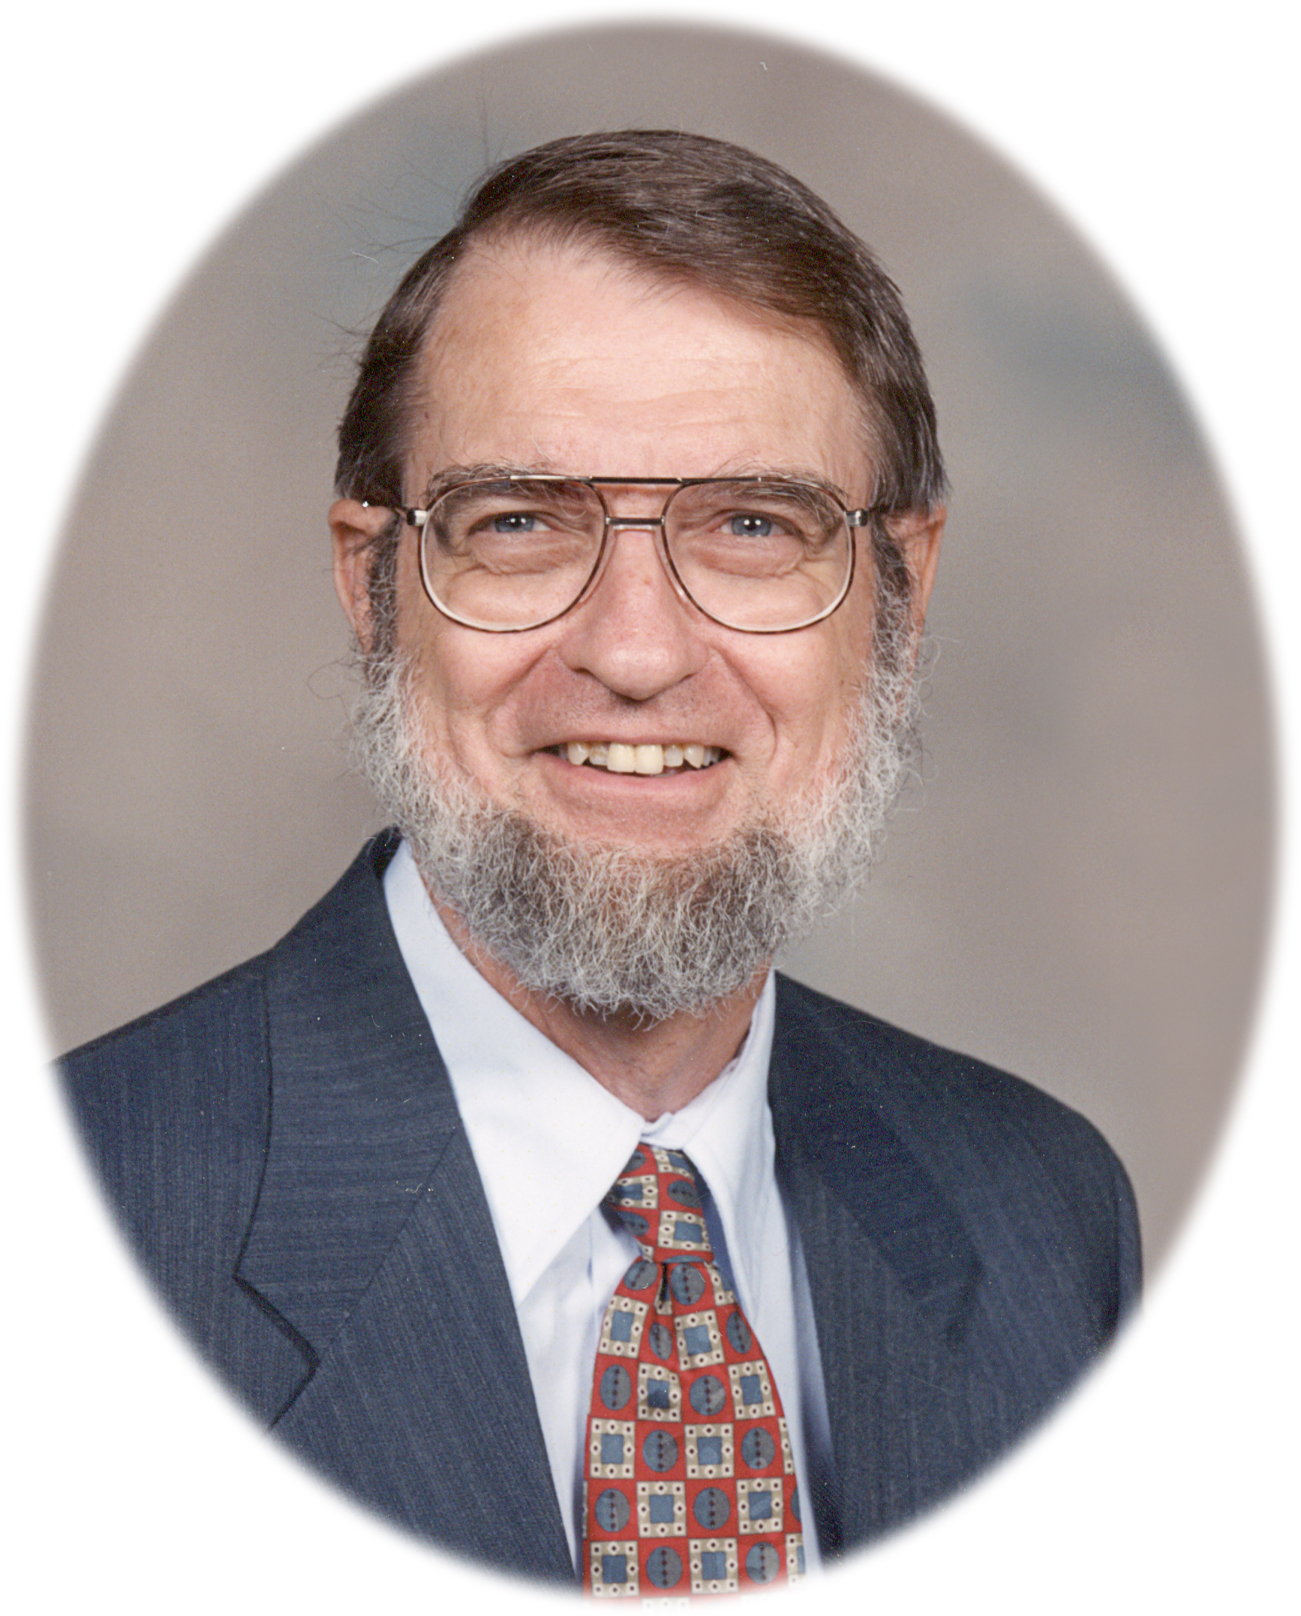 James B. Johnson